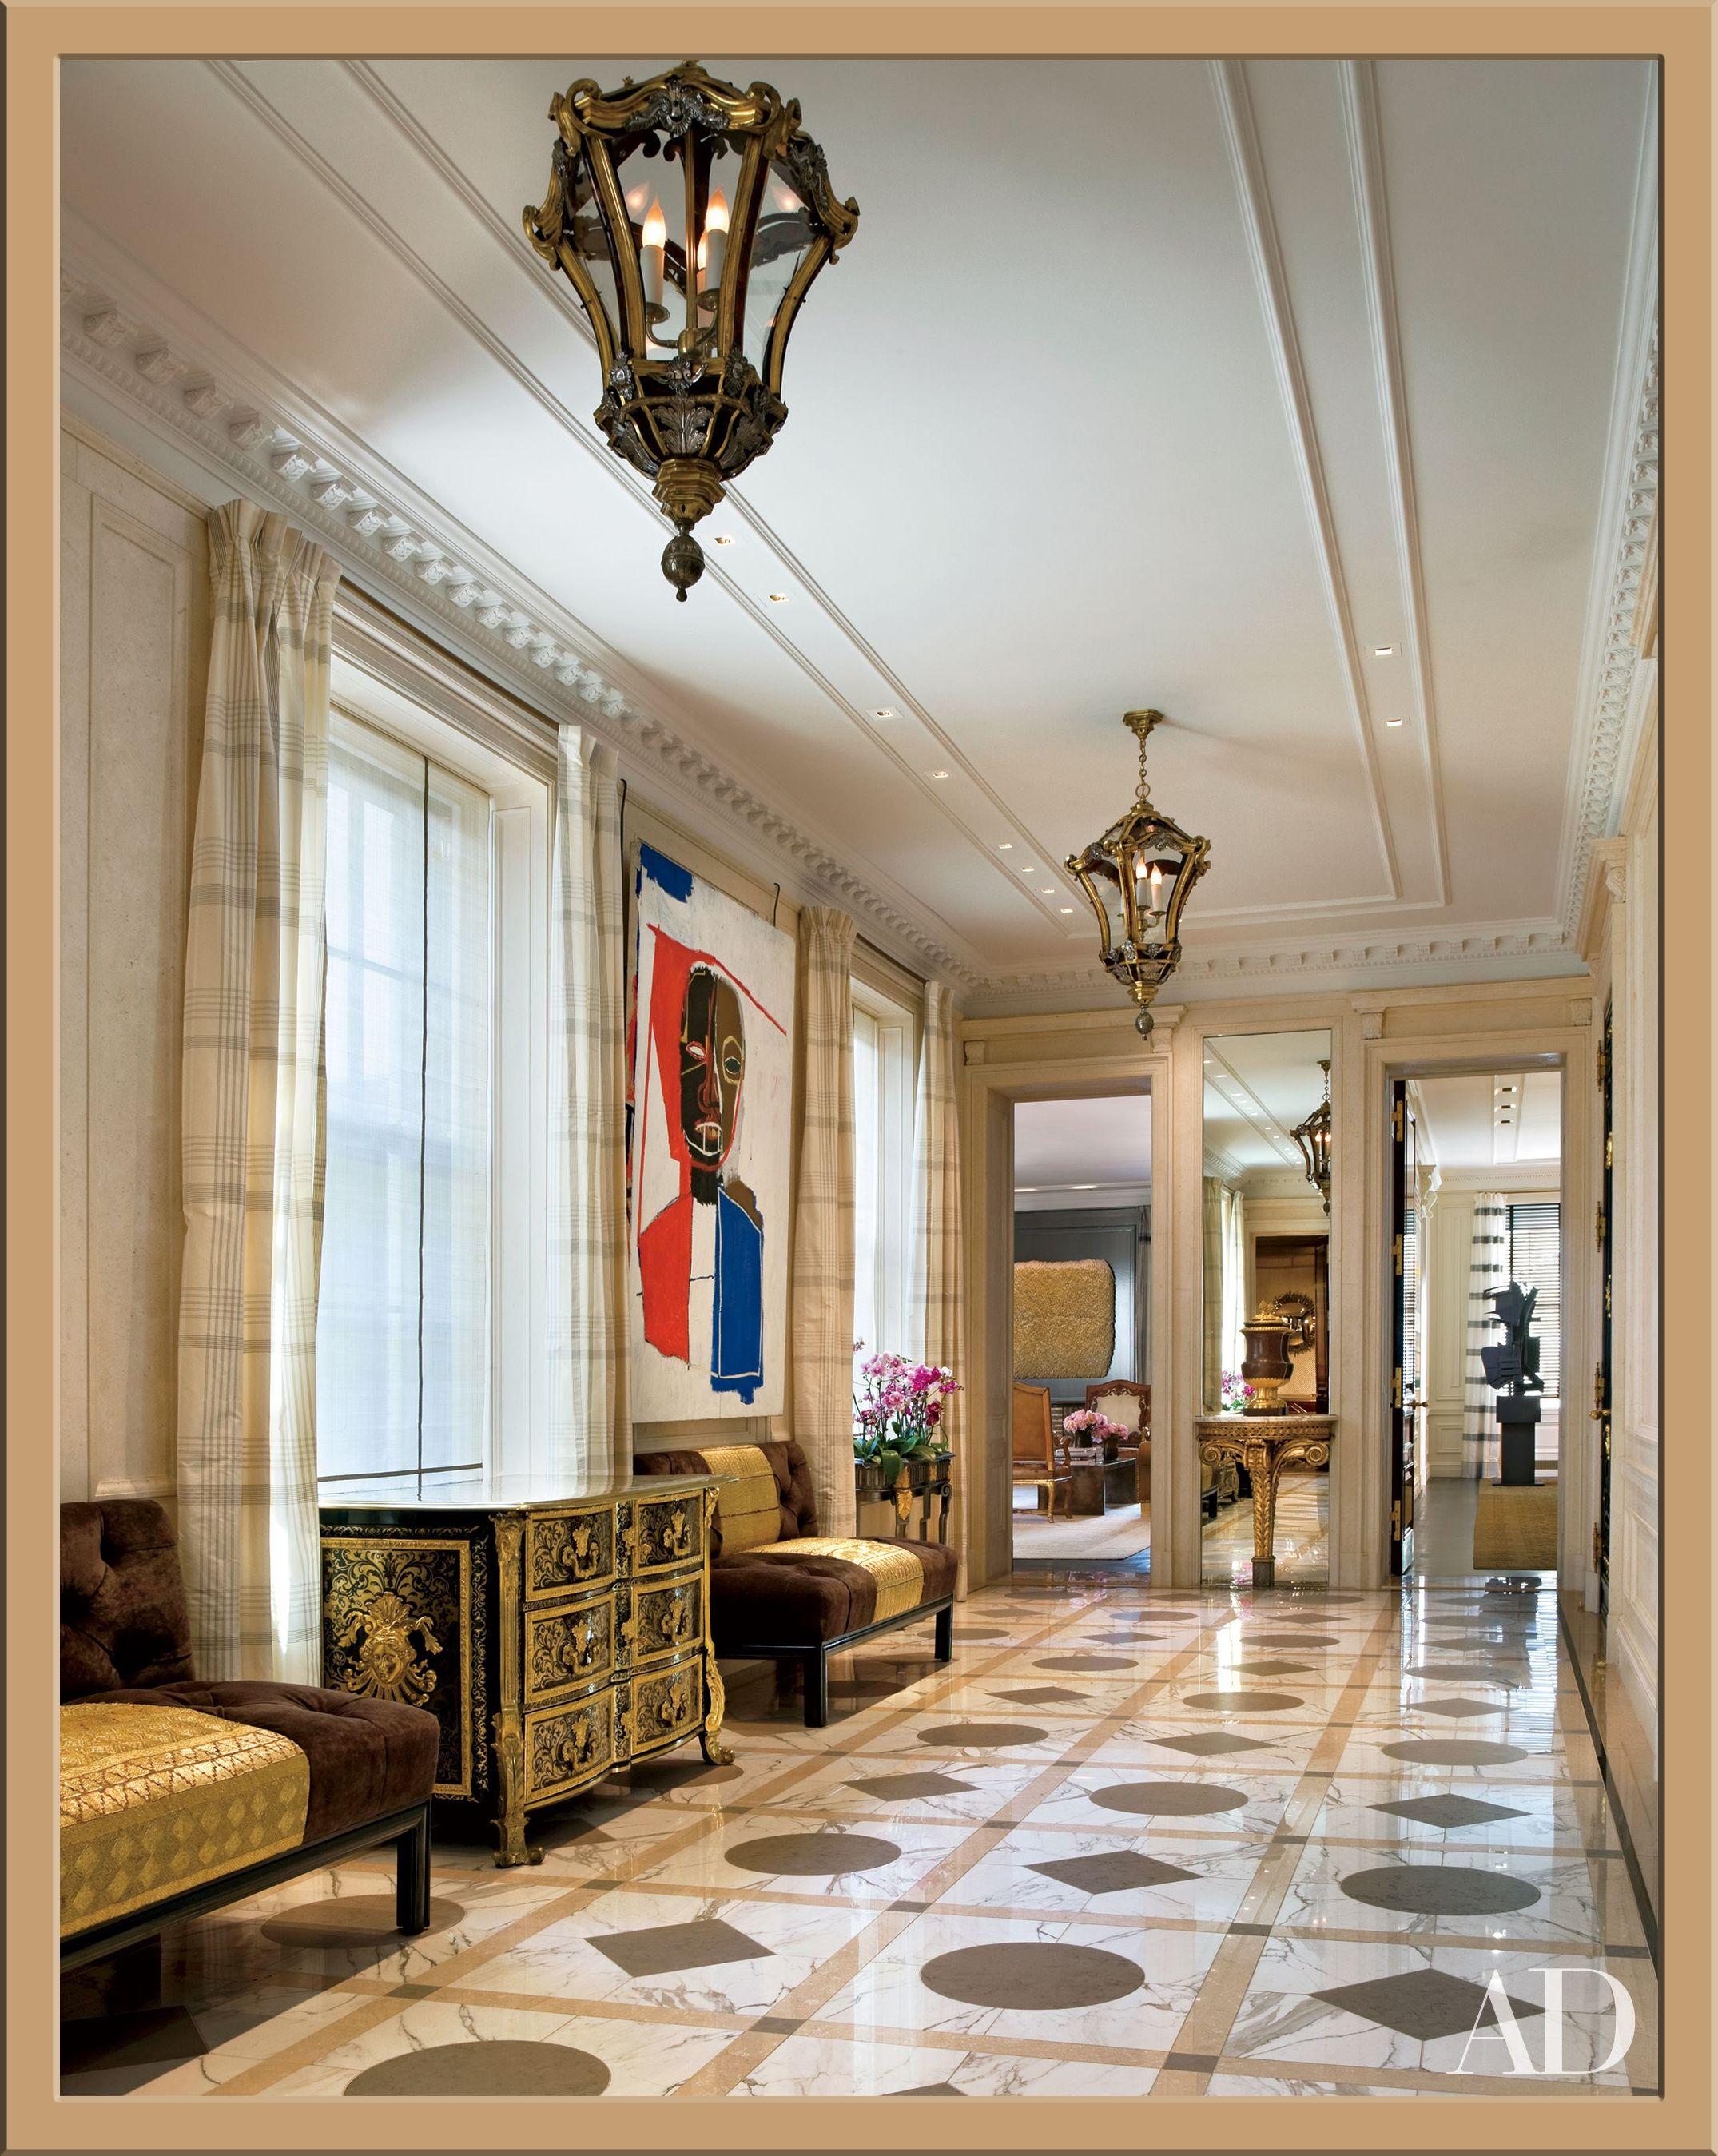 A Simple Plan For Interior Design